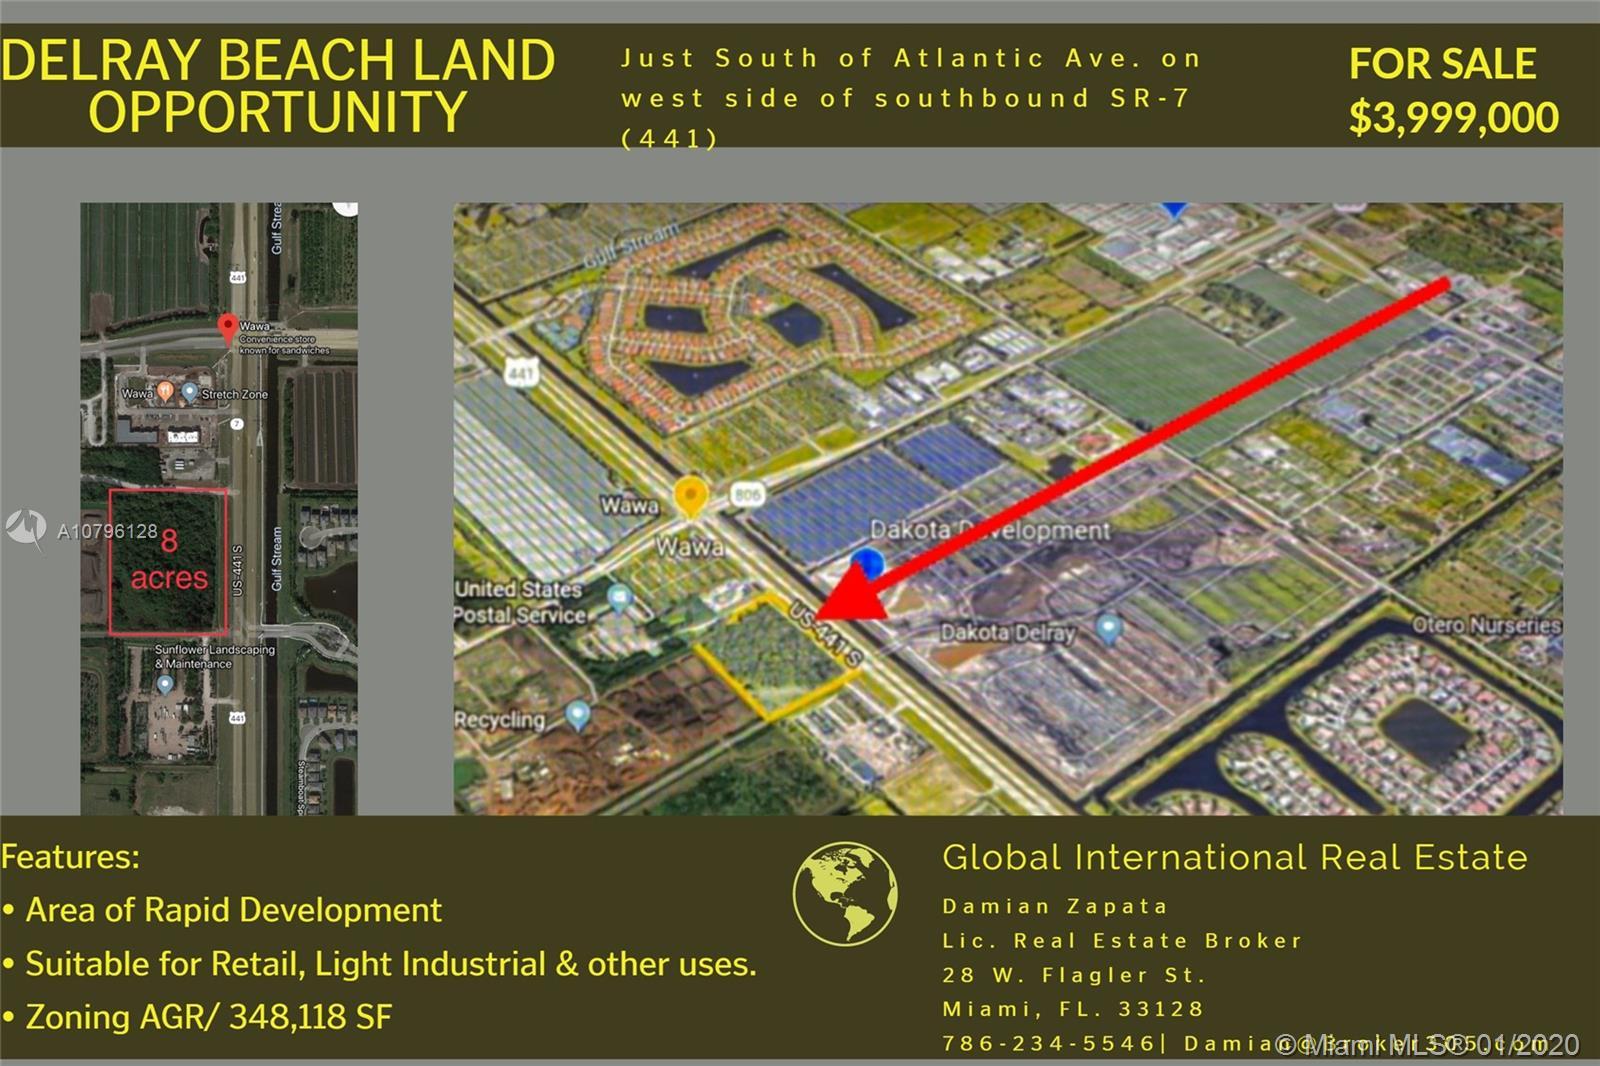 441 (SR-7), Delray Beach, FL 33446